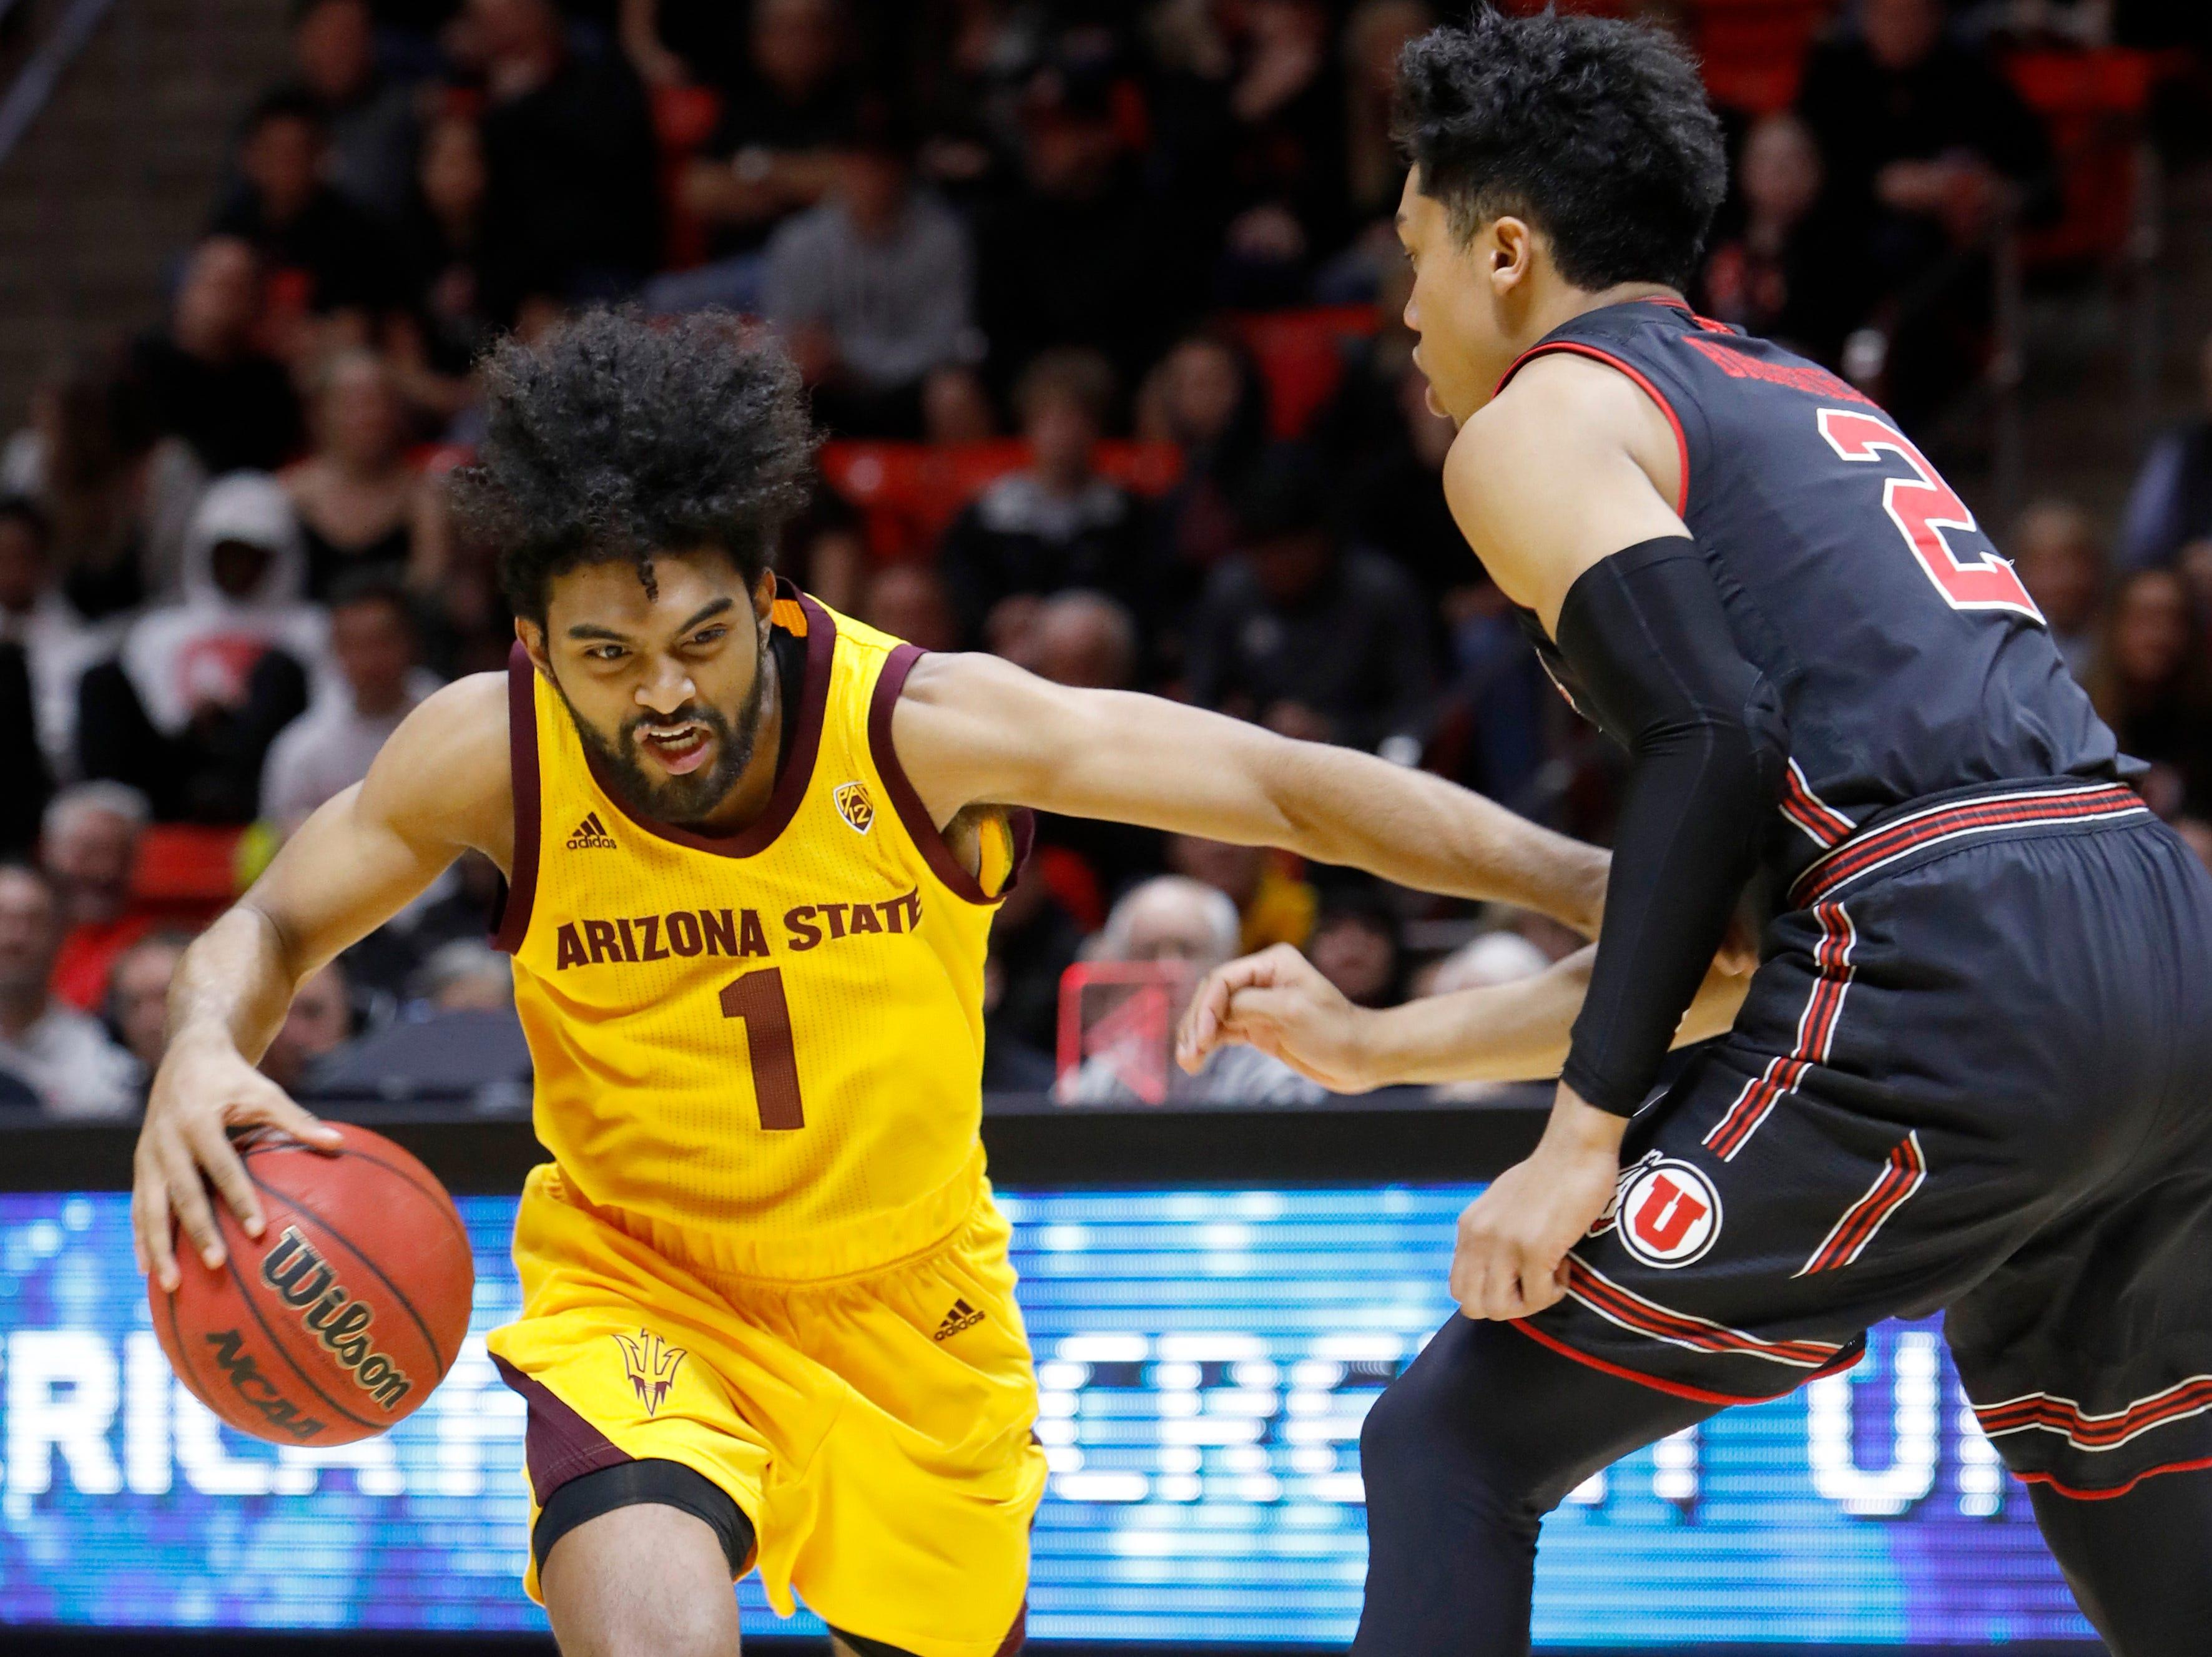 Arizona State's Remy Martin (1) dribbles past Utah's Sedrick Barefield (2) during the first half of an NCAA college basketball game Saturday, Feb. 16, 2019, in Salt Lake City. (AP Photo/Kim Raff)